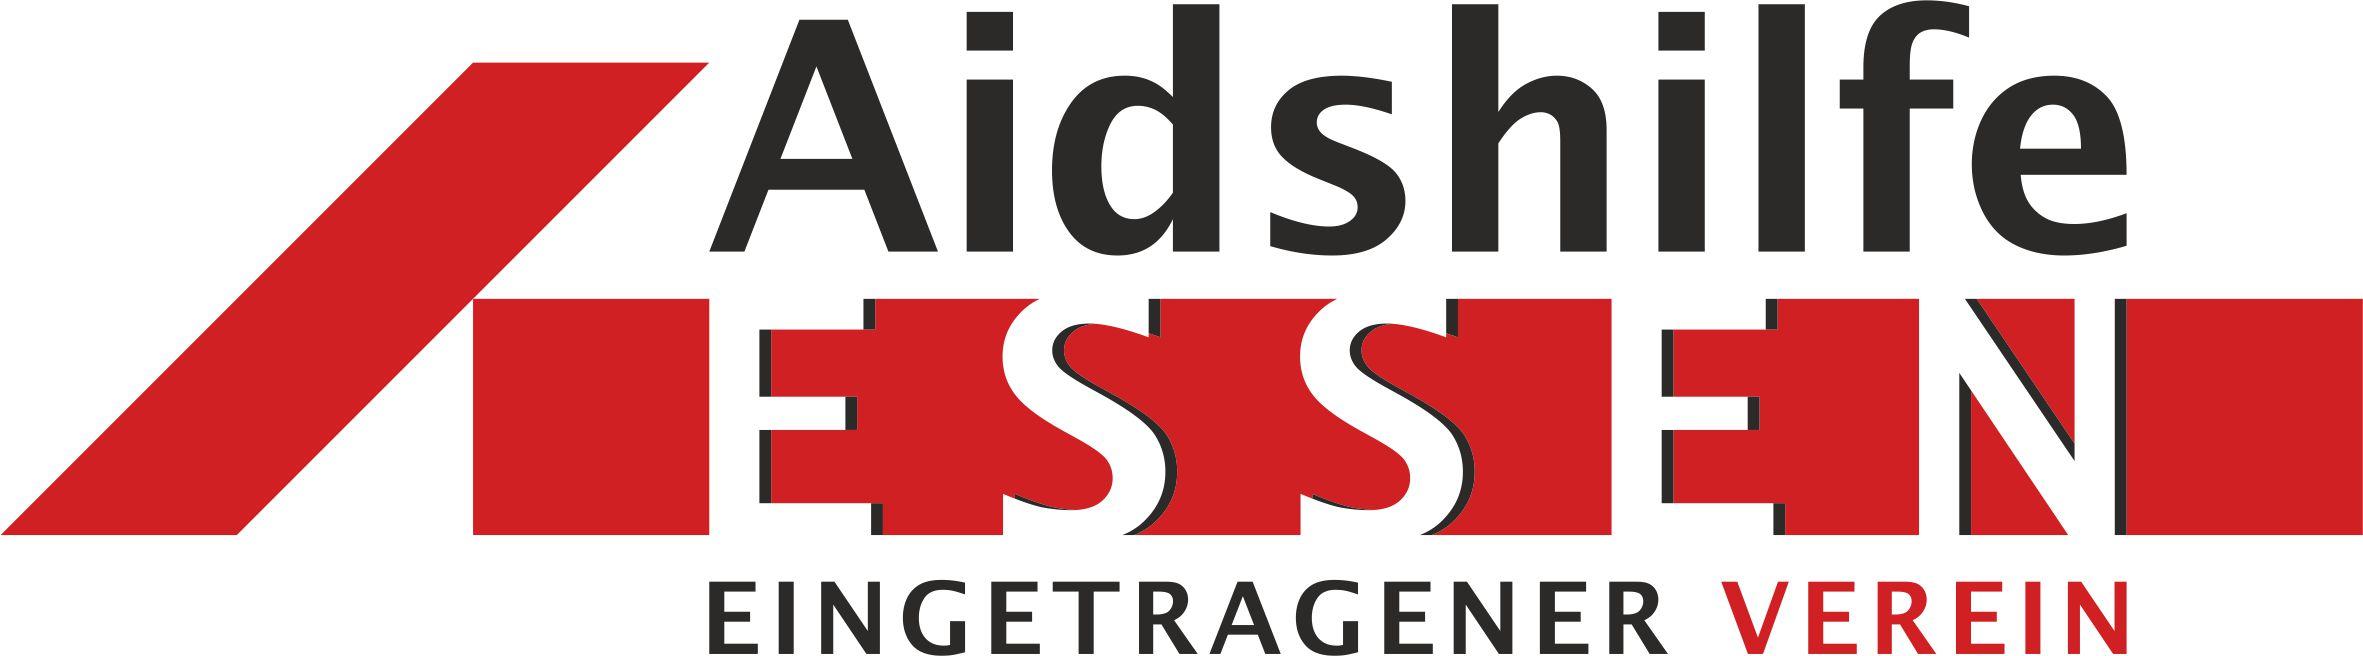 2017 - Original Signet Aidshilfe Essen